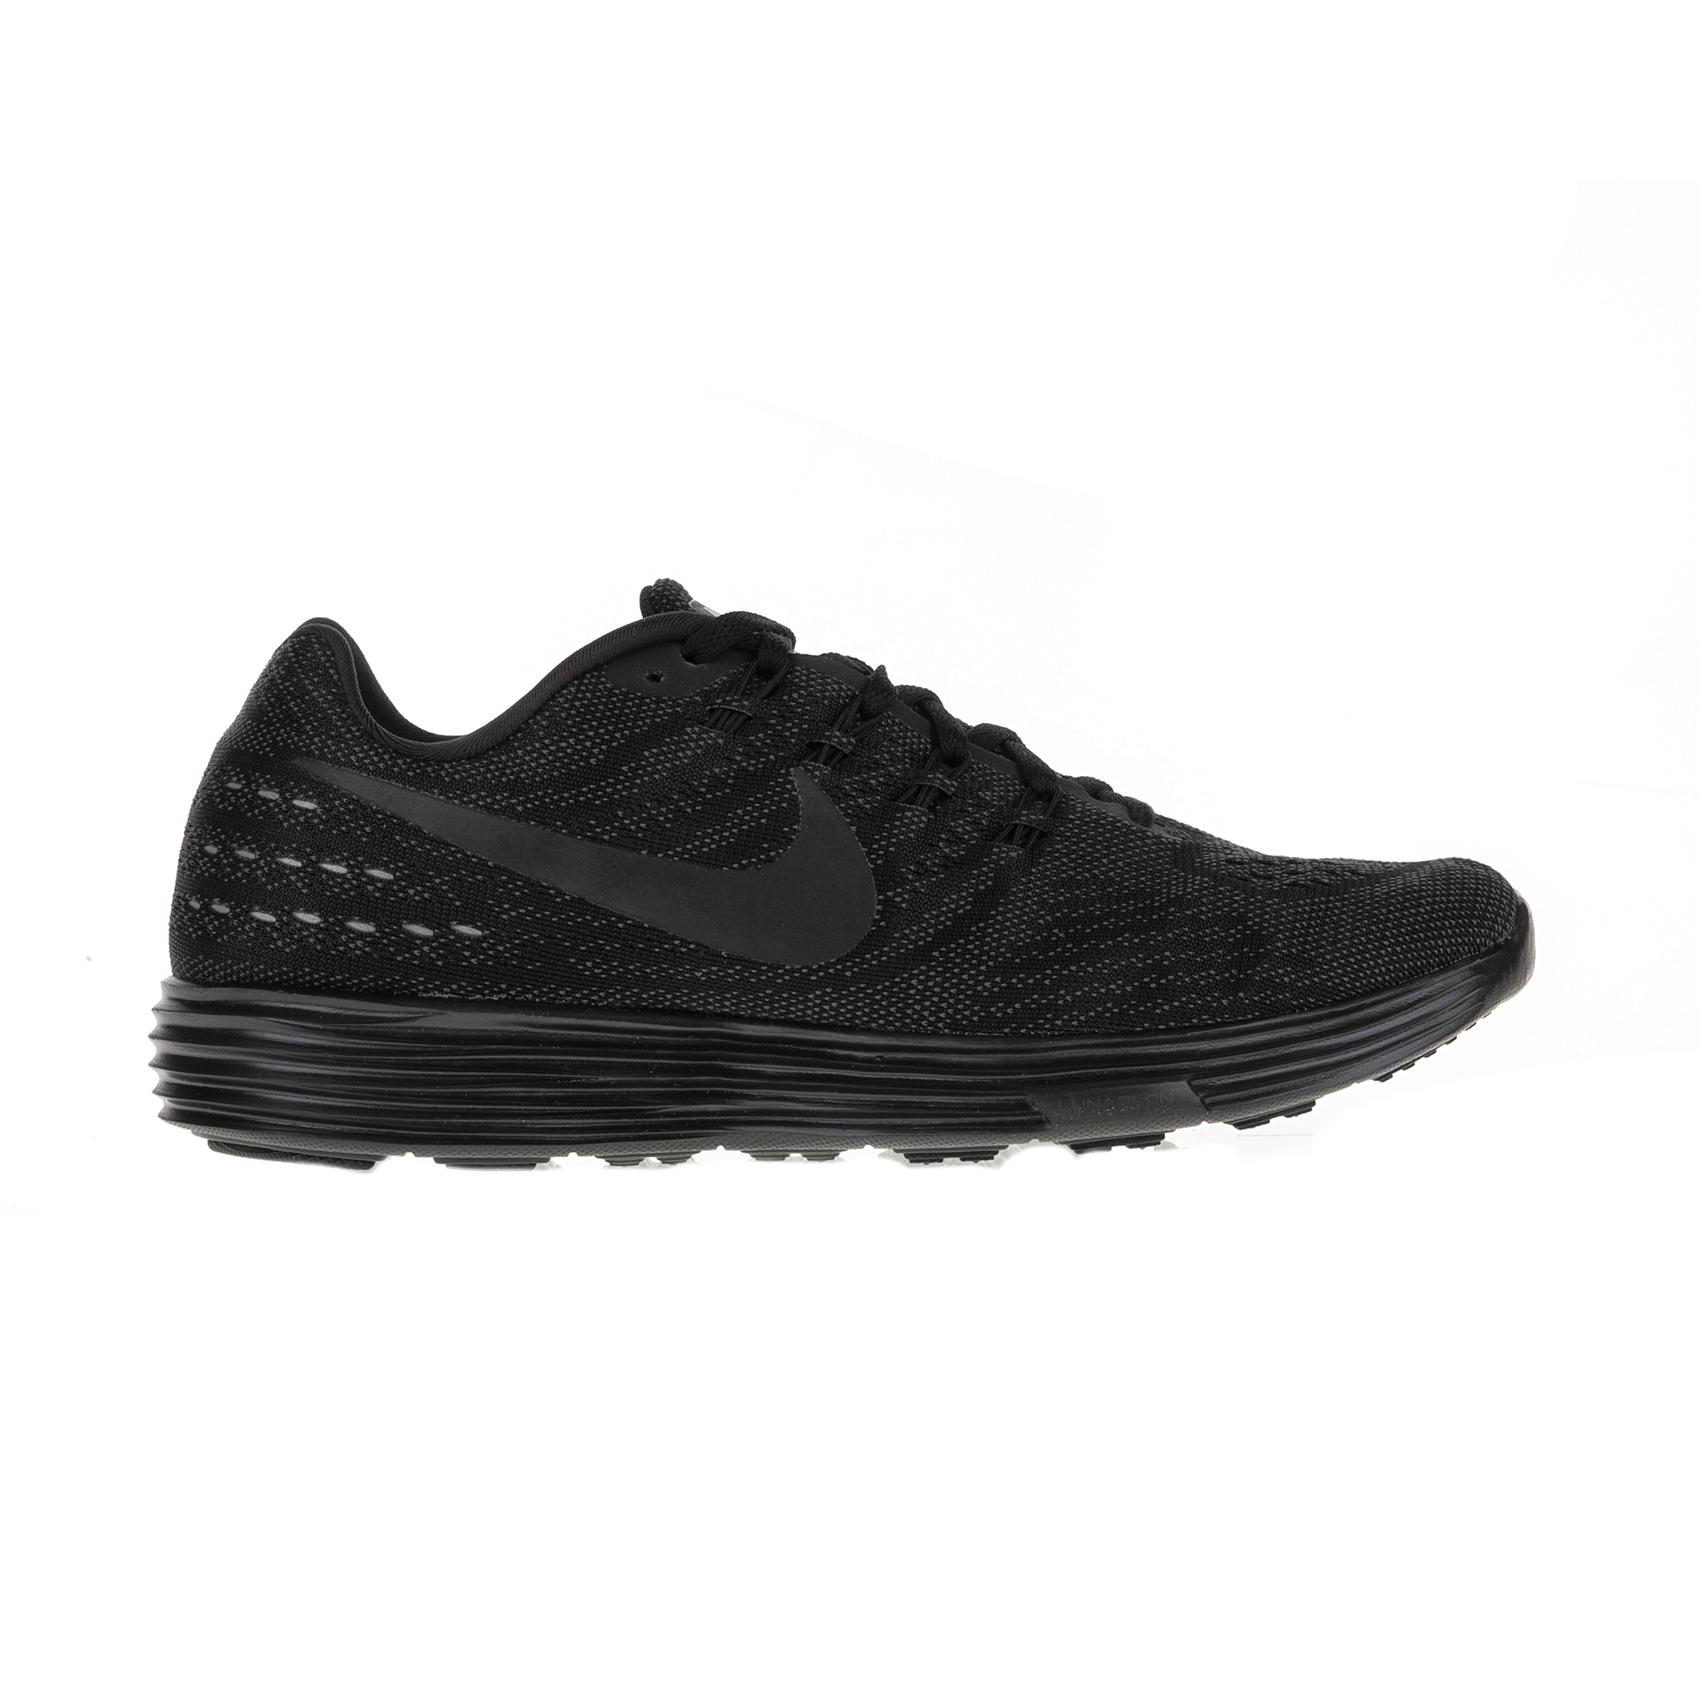 NIKE – Ανδρικά αθλητικά παπούτσια Nike LUNARTEMPO 2 μαύρα